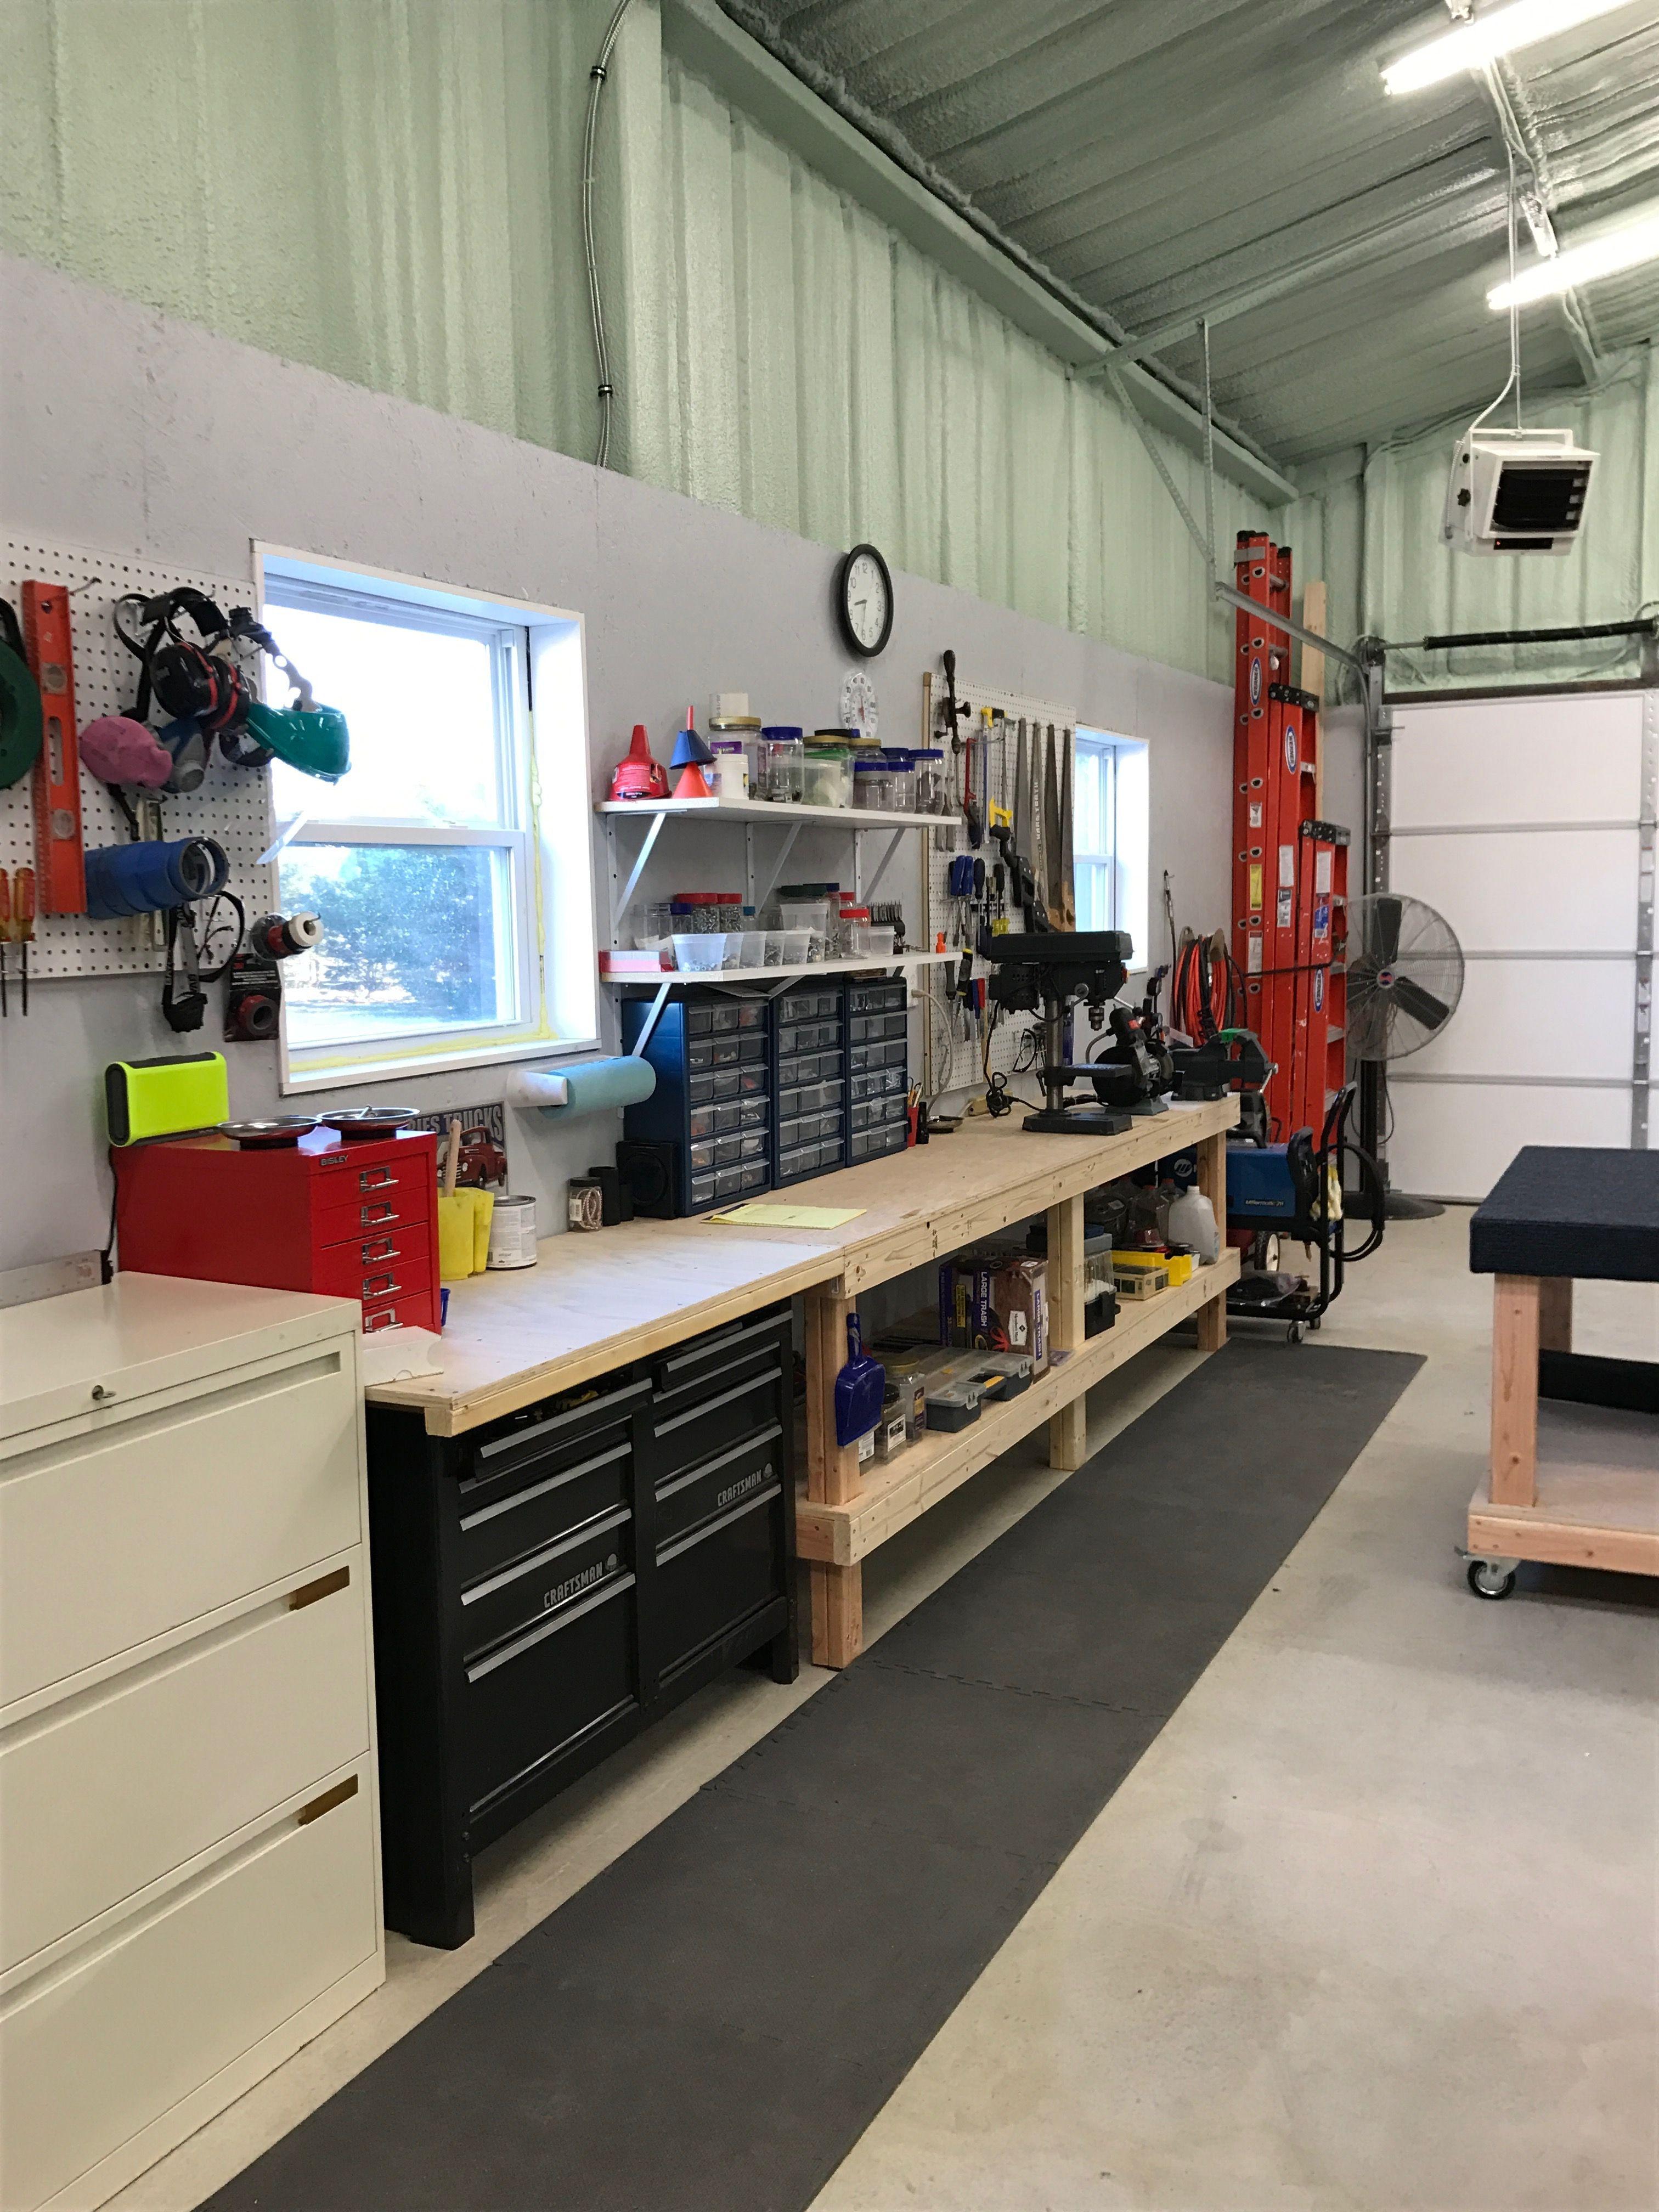 pingl par mathis pereira sur garage rangement outil garage amenagement garage et rangement. Black Bedroom Furniture Sets. Home Design Ideas